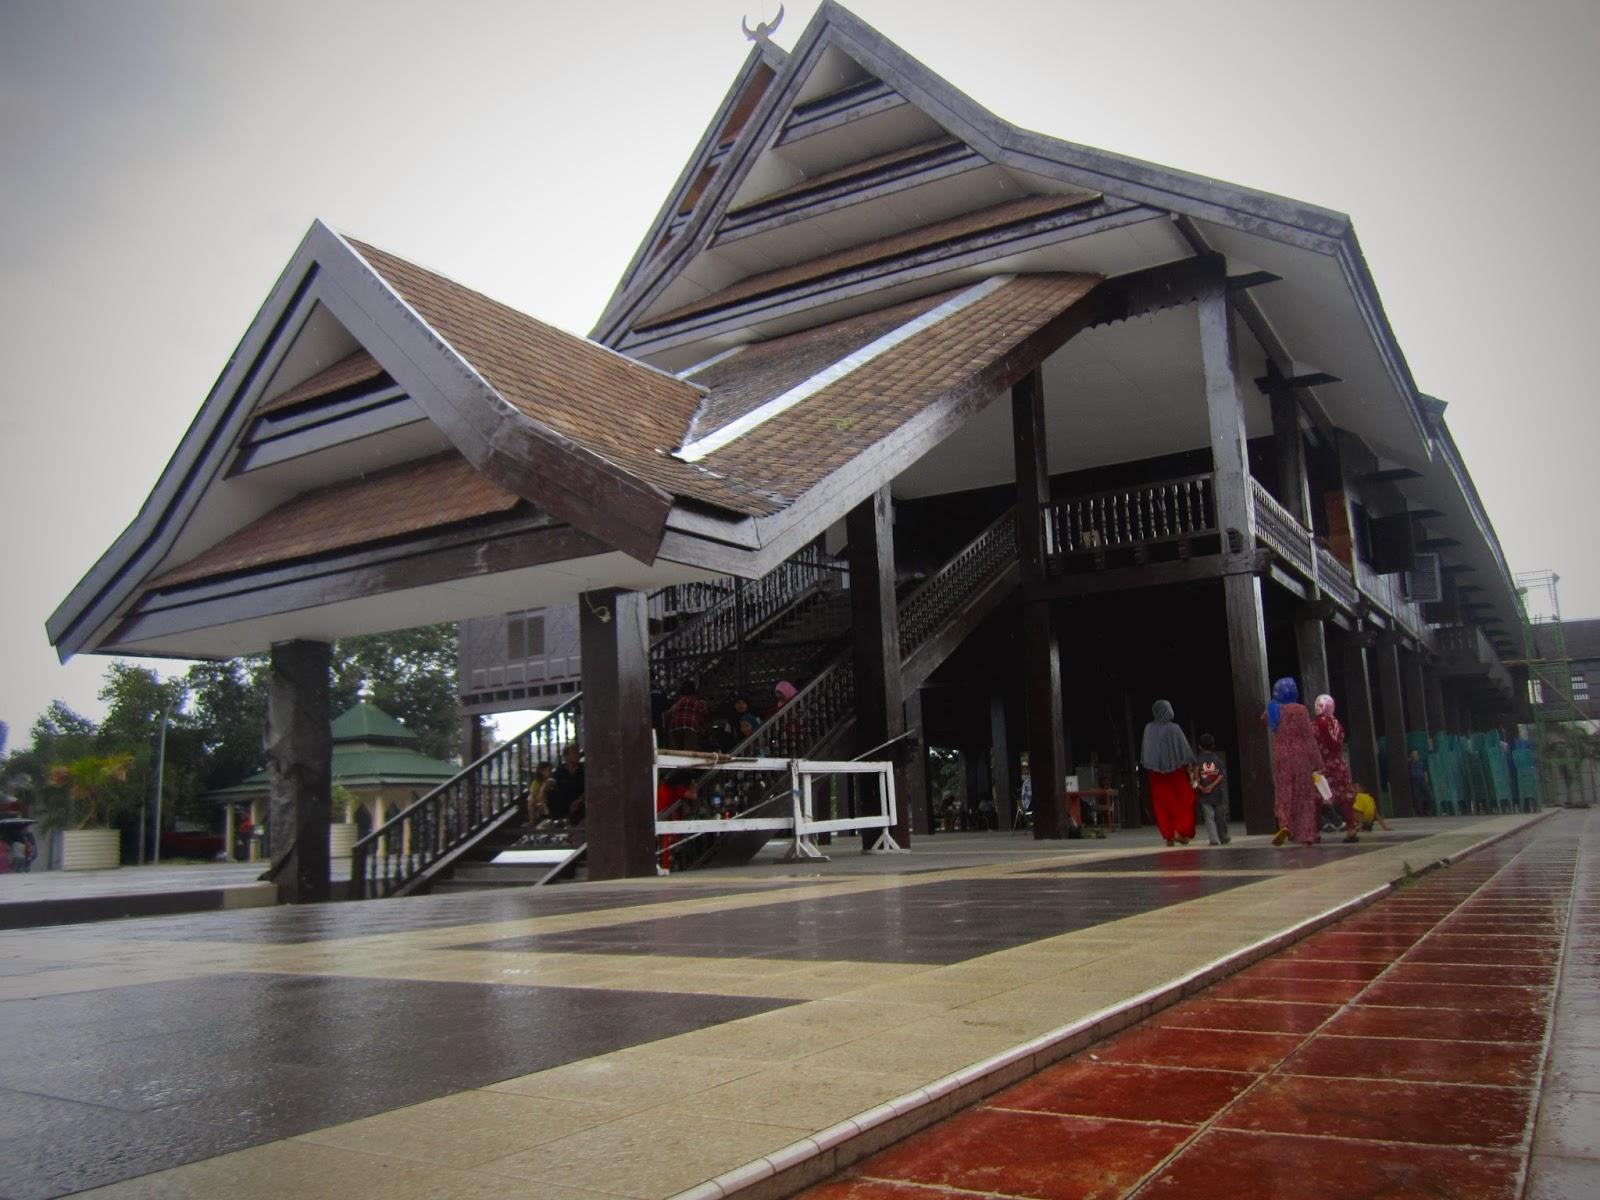 Menjelahi Tempat Bersejarah Gowa Makassar Tak Des Museum Balla Lompoa